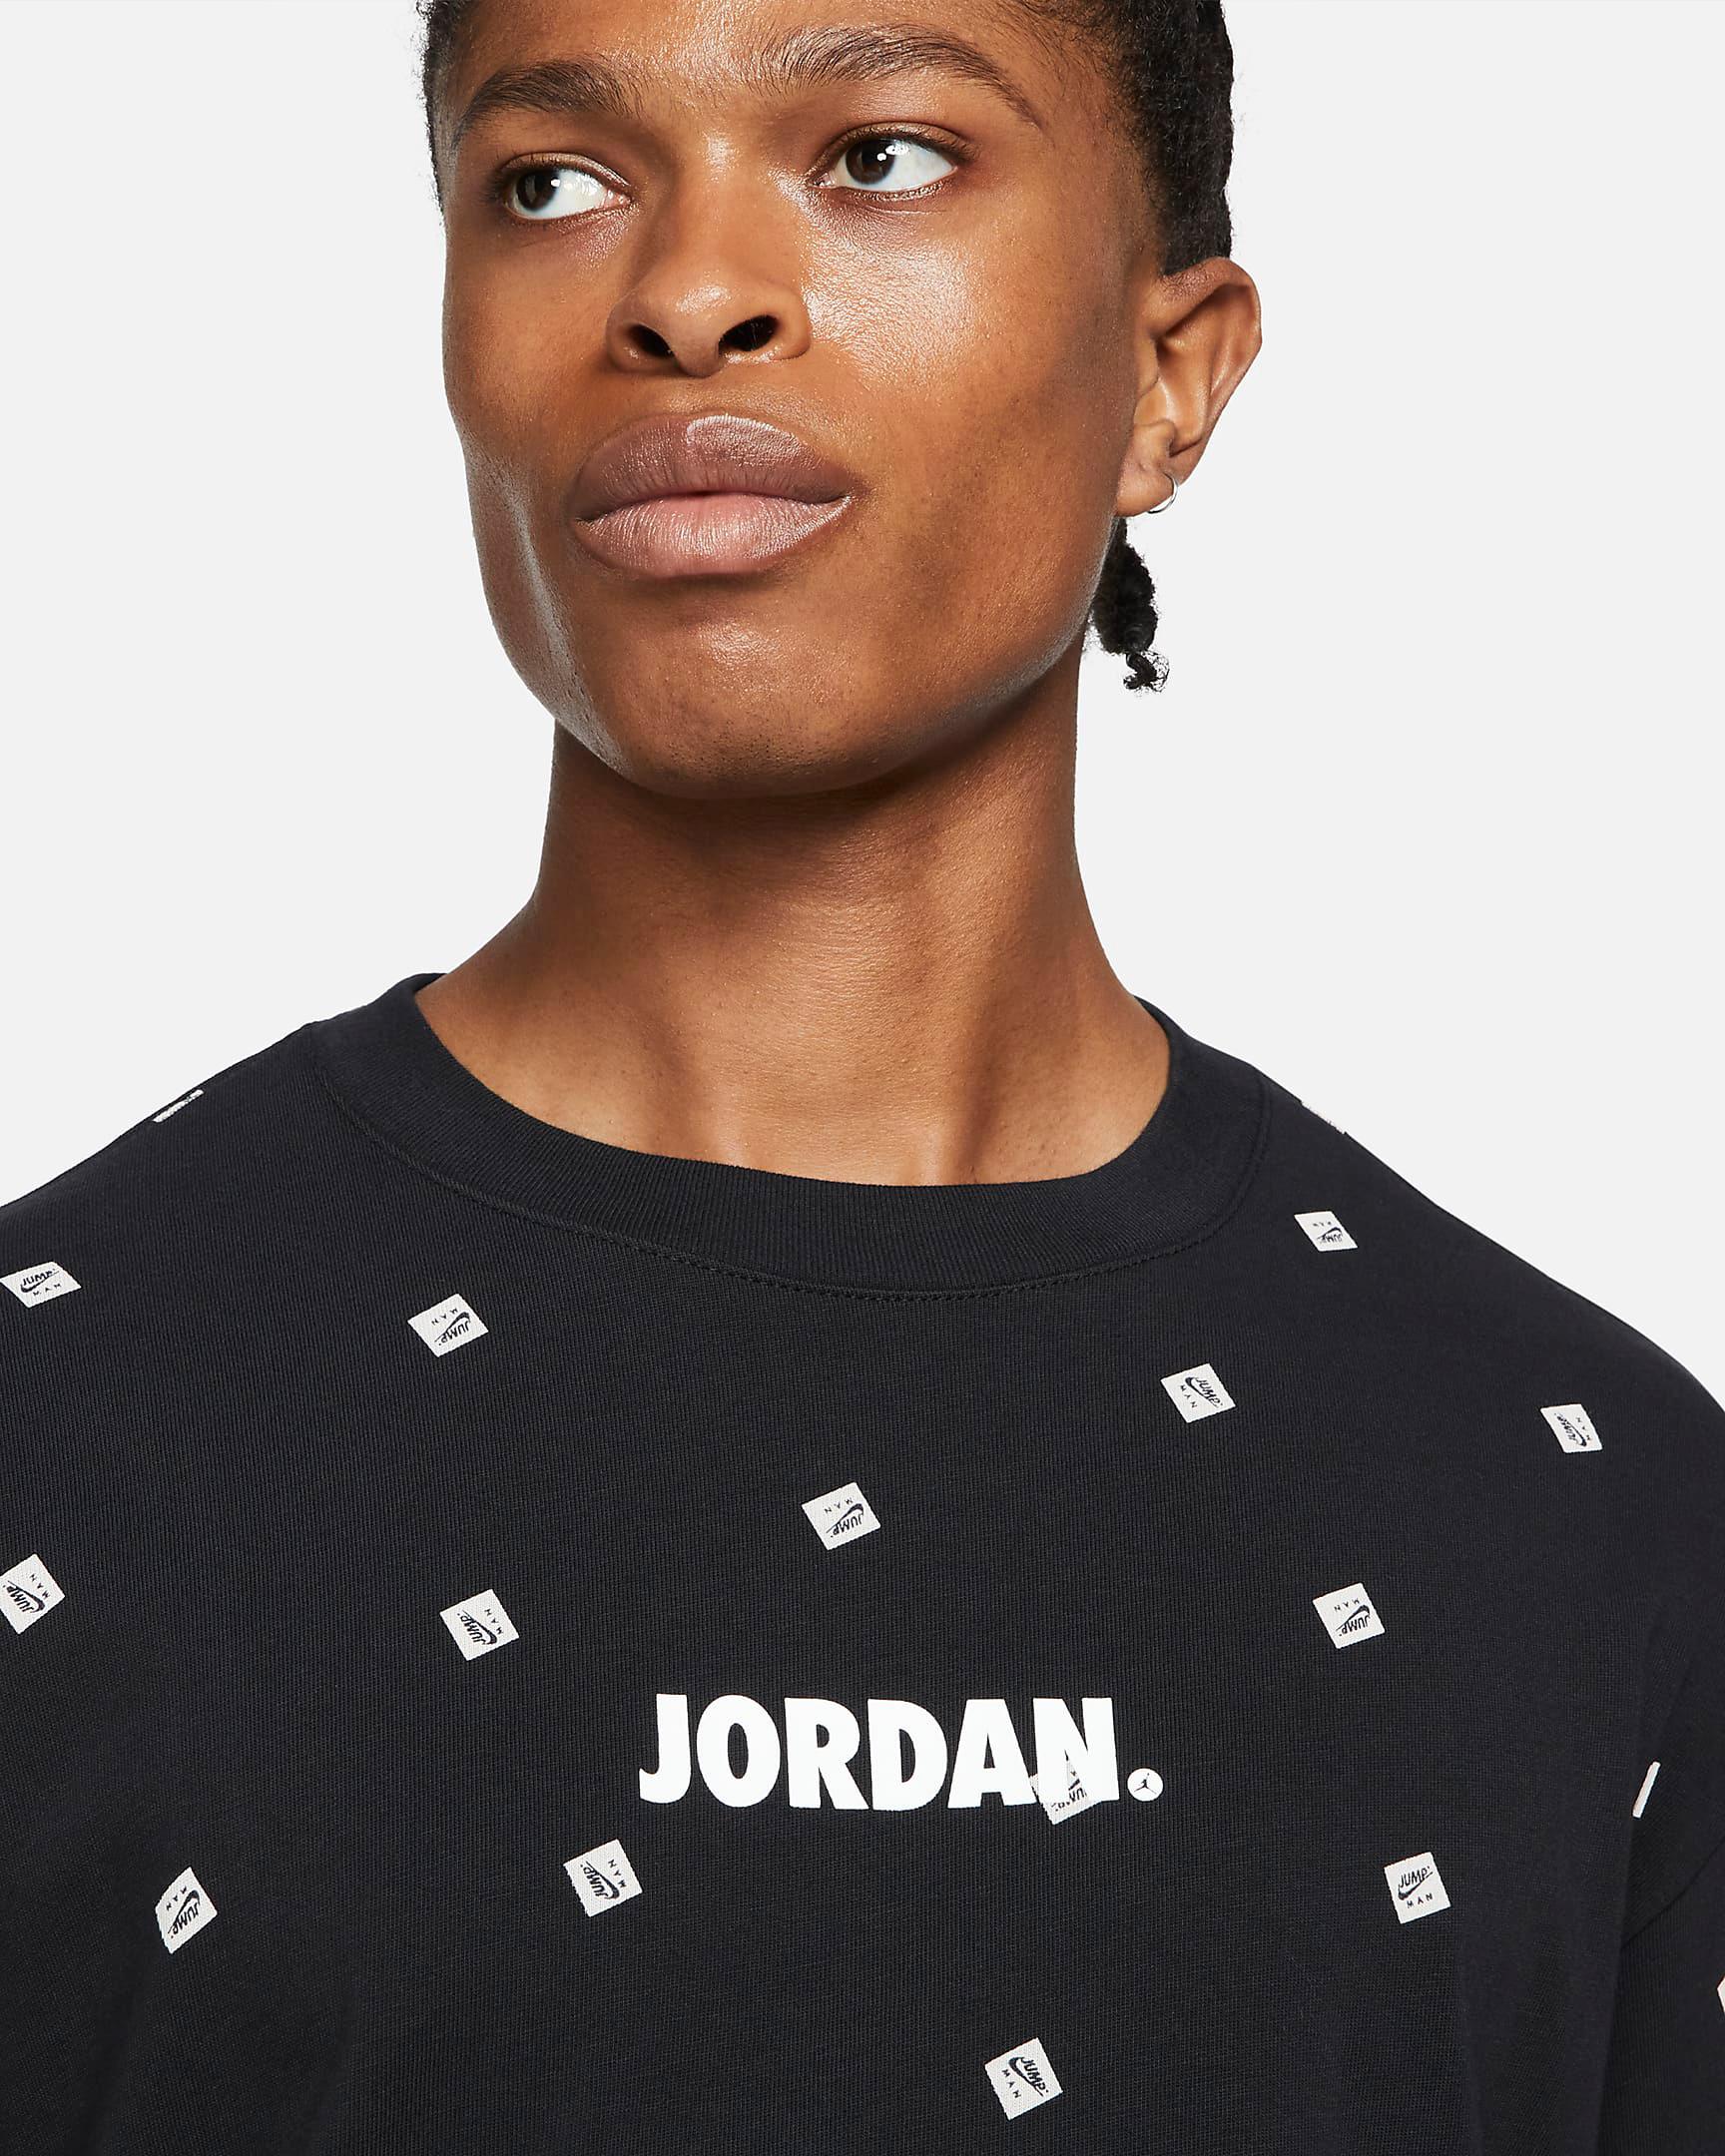 jordan-jumpman-classic-allover-print-shirt-black-white-2